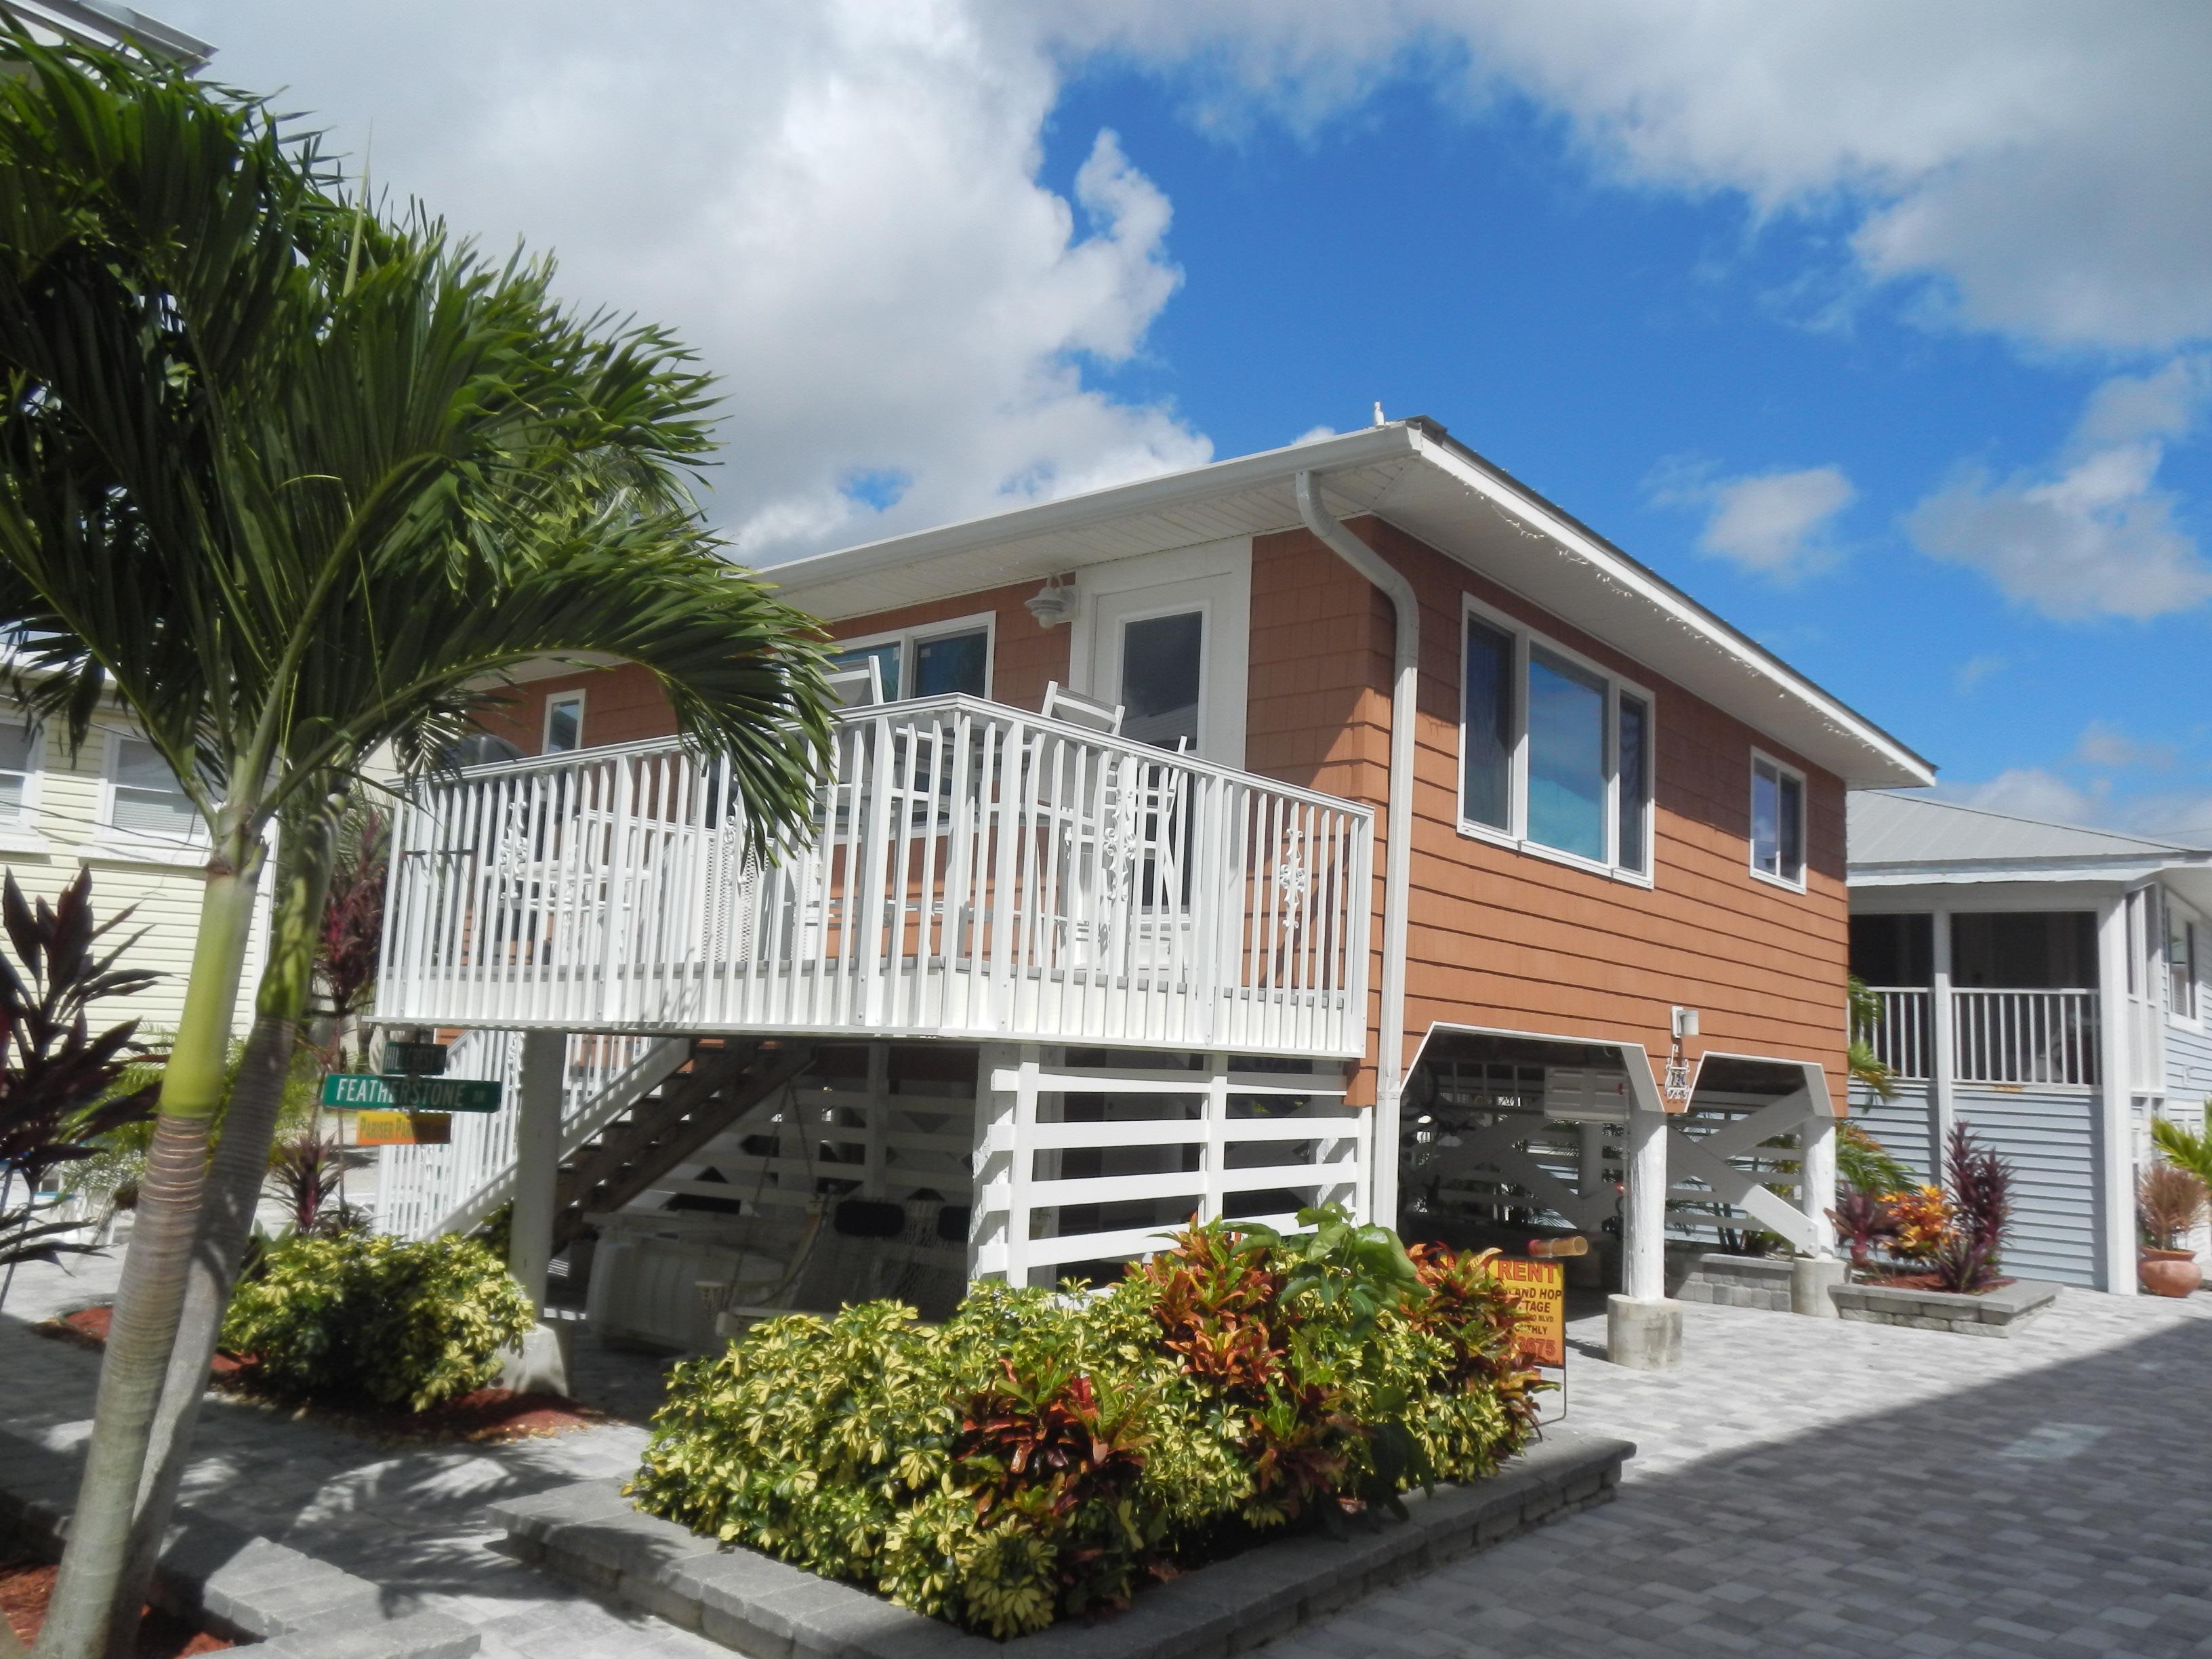 Island Hop Cottage